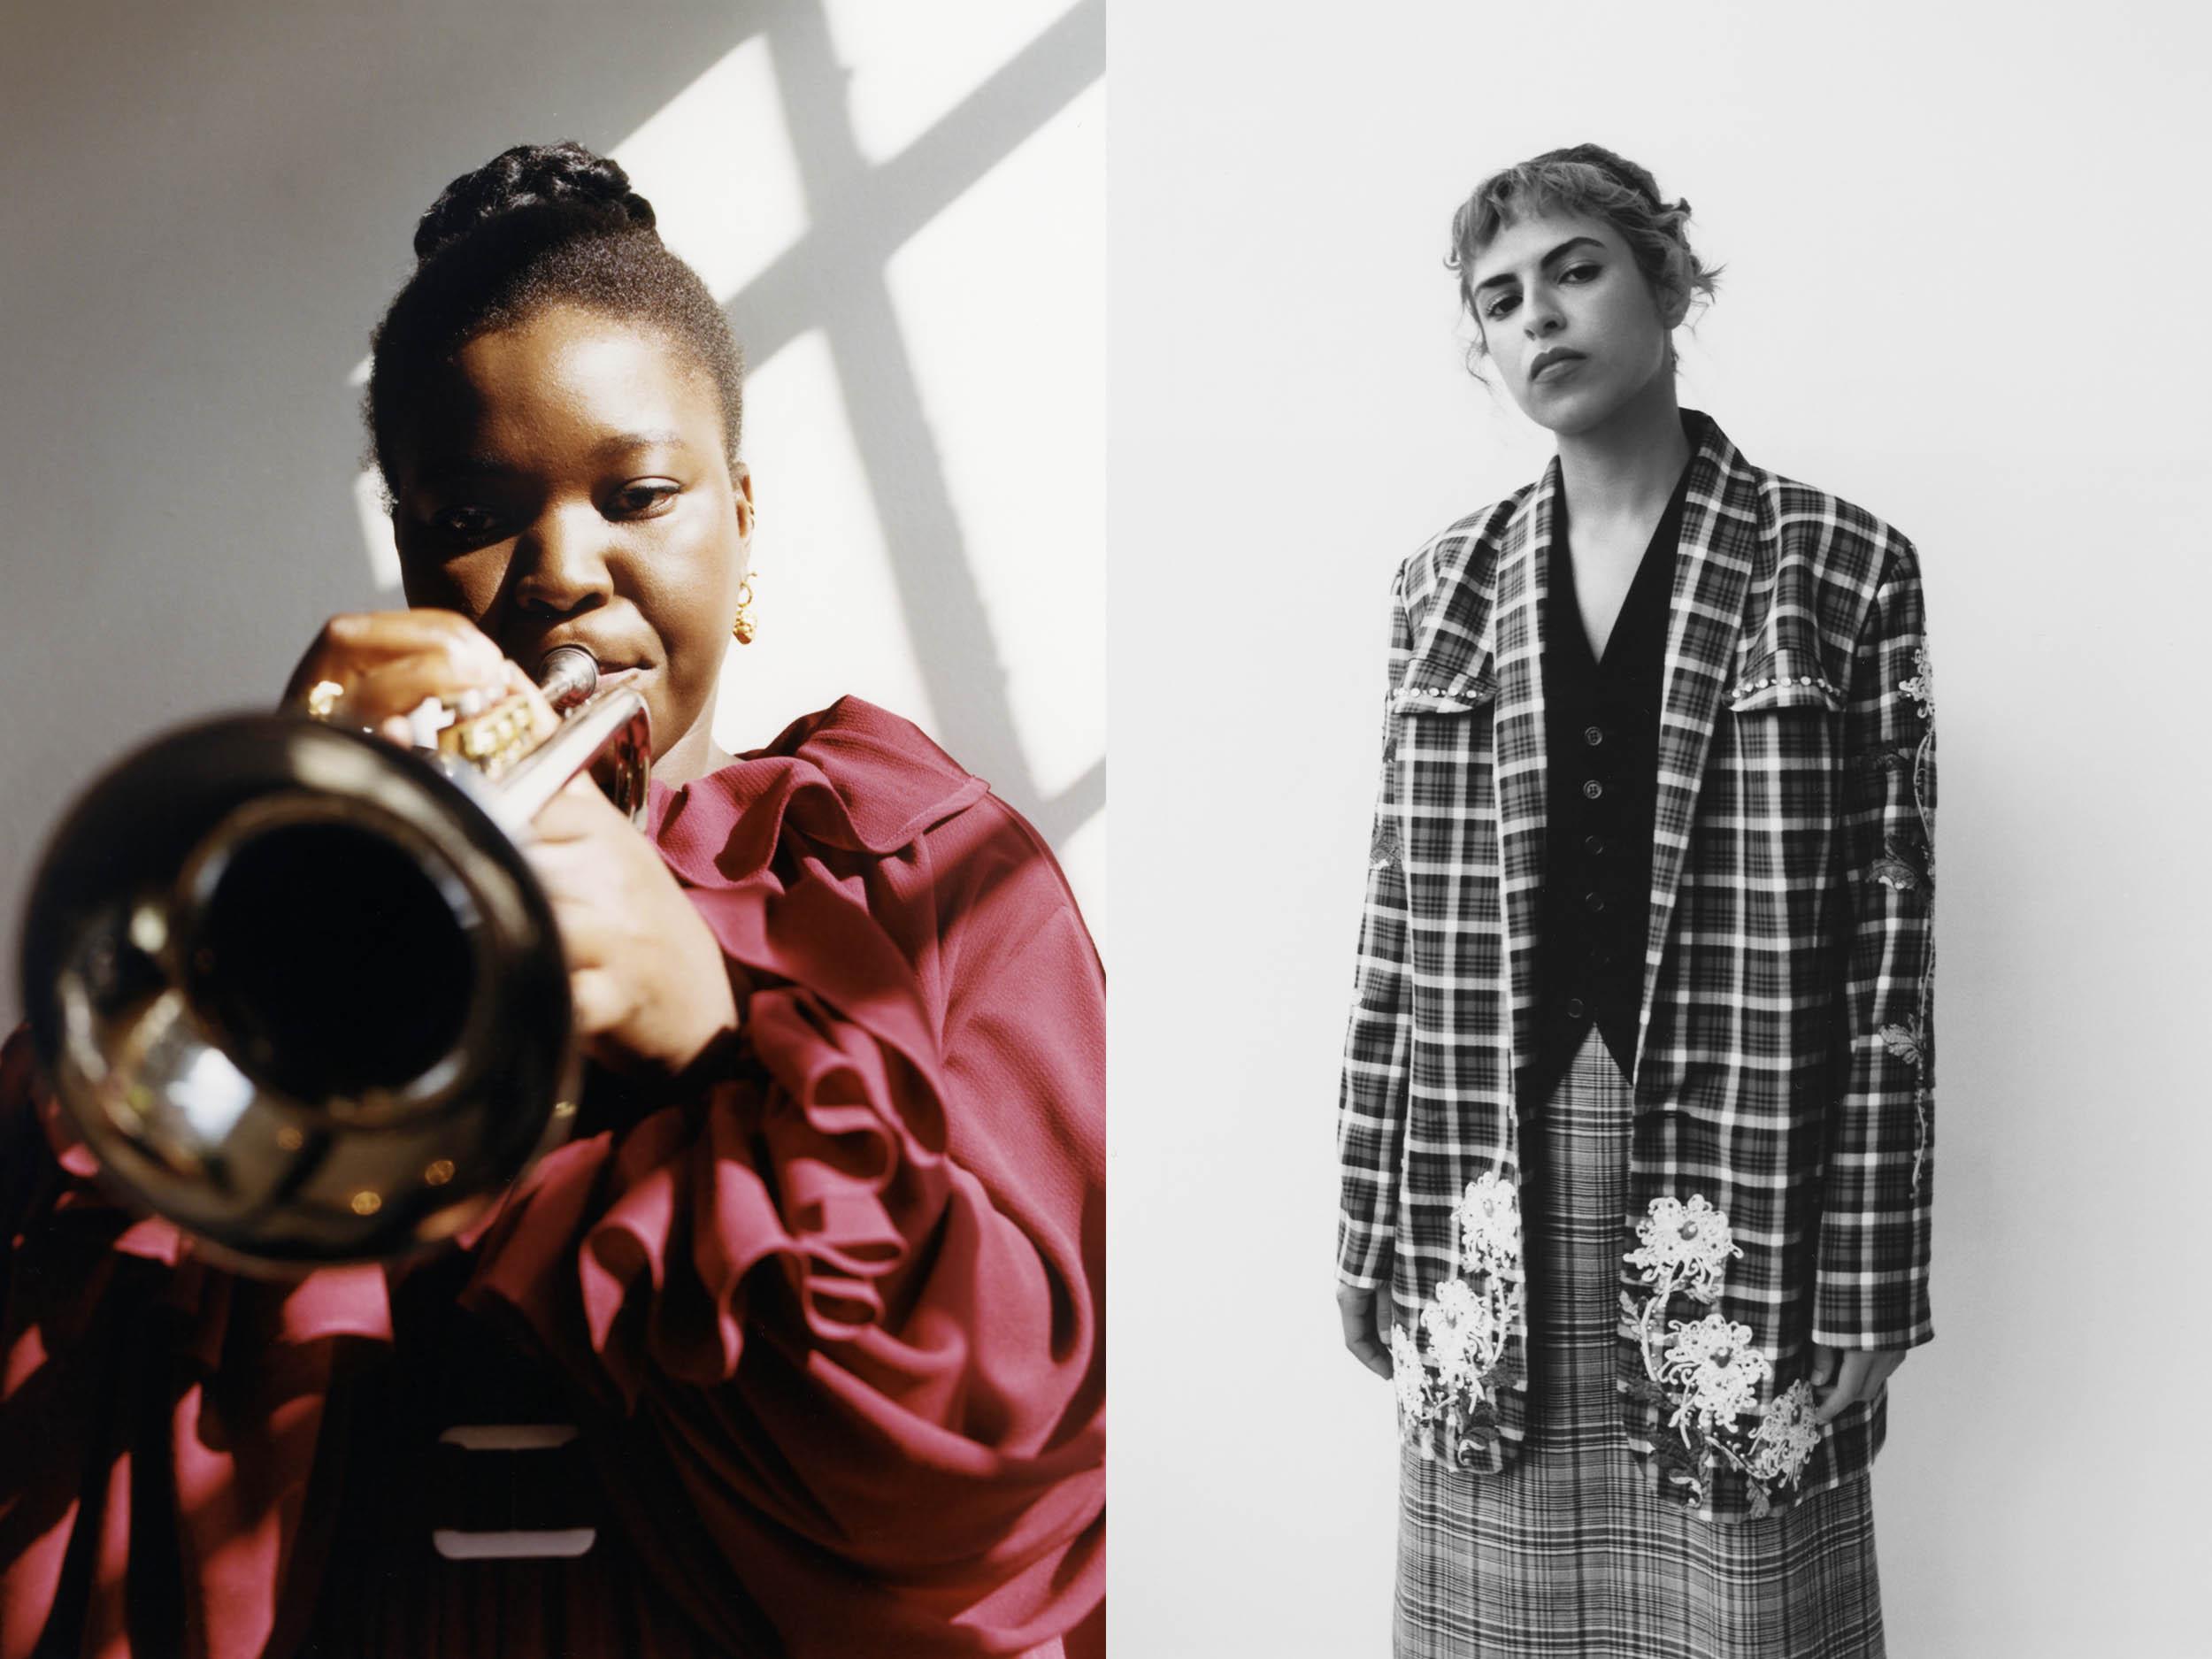 Meet 9 London musicians reminding us that art is essential work